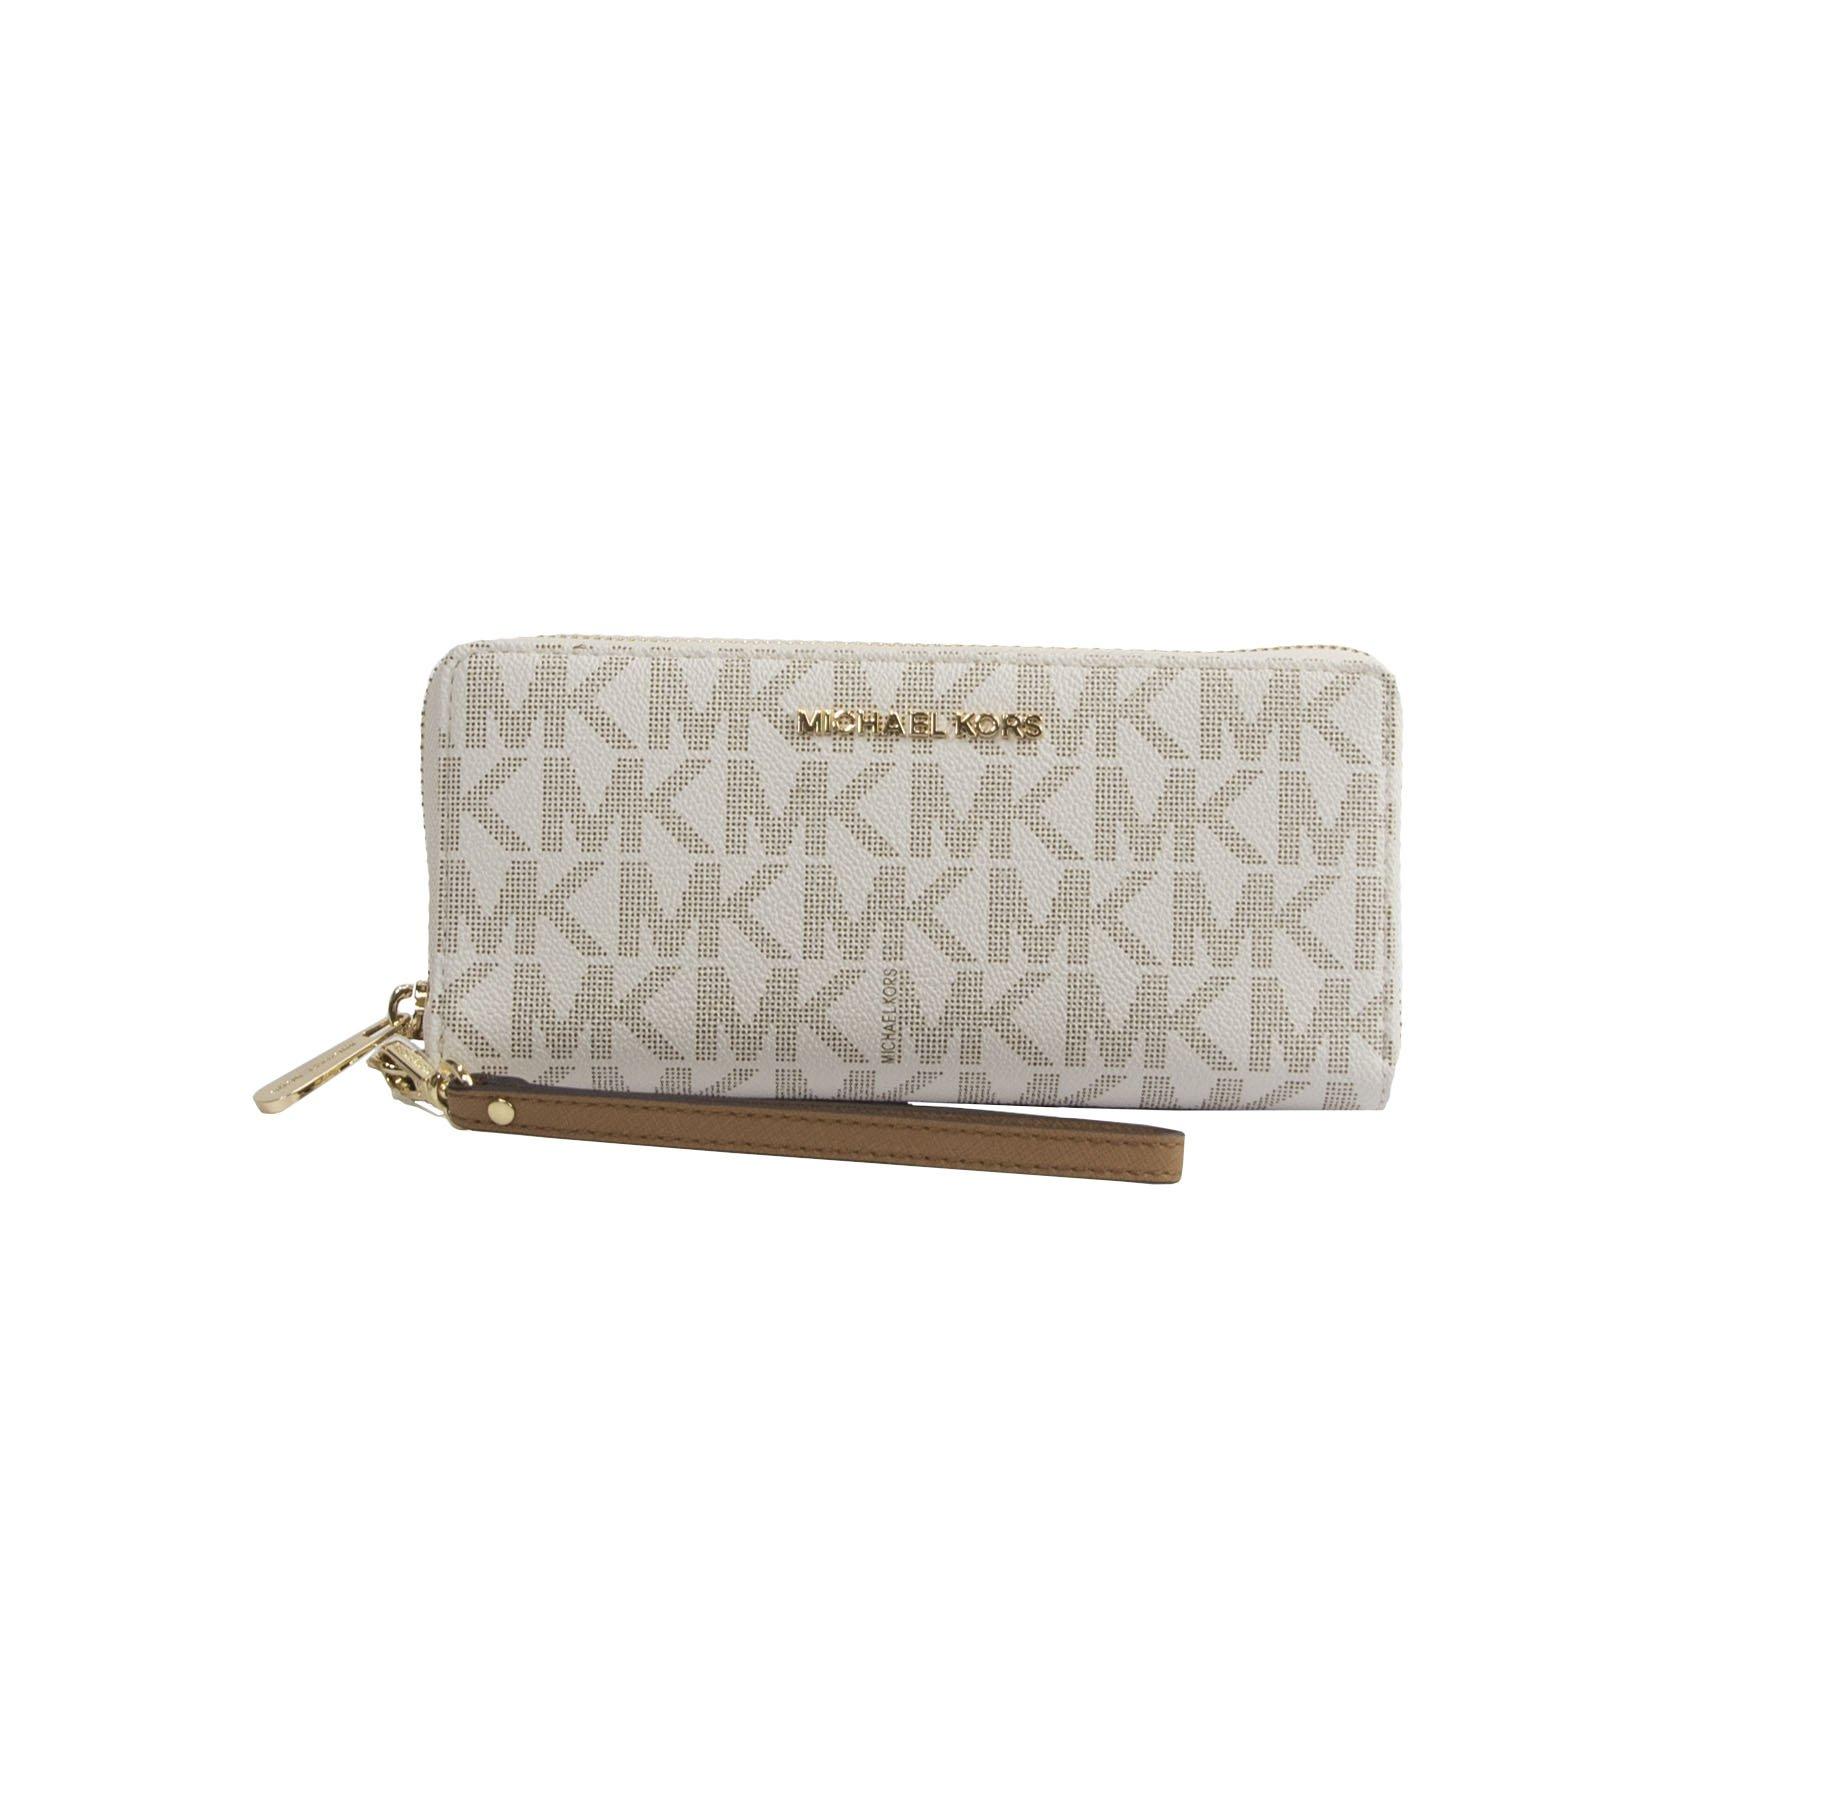 Michael Kors Vanilla Monogram Acorn Leather Large Zip Around Travel Wallet by Michael Kors